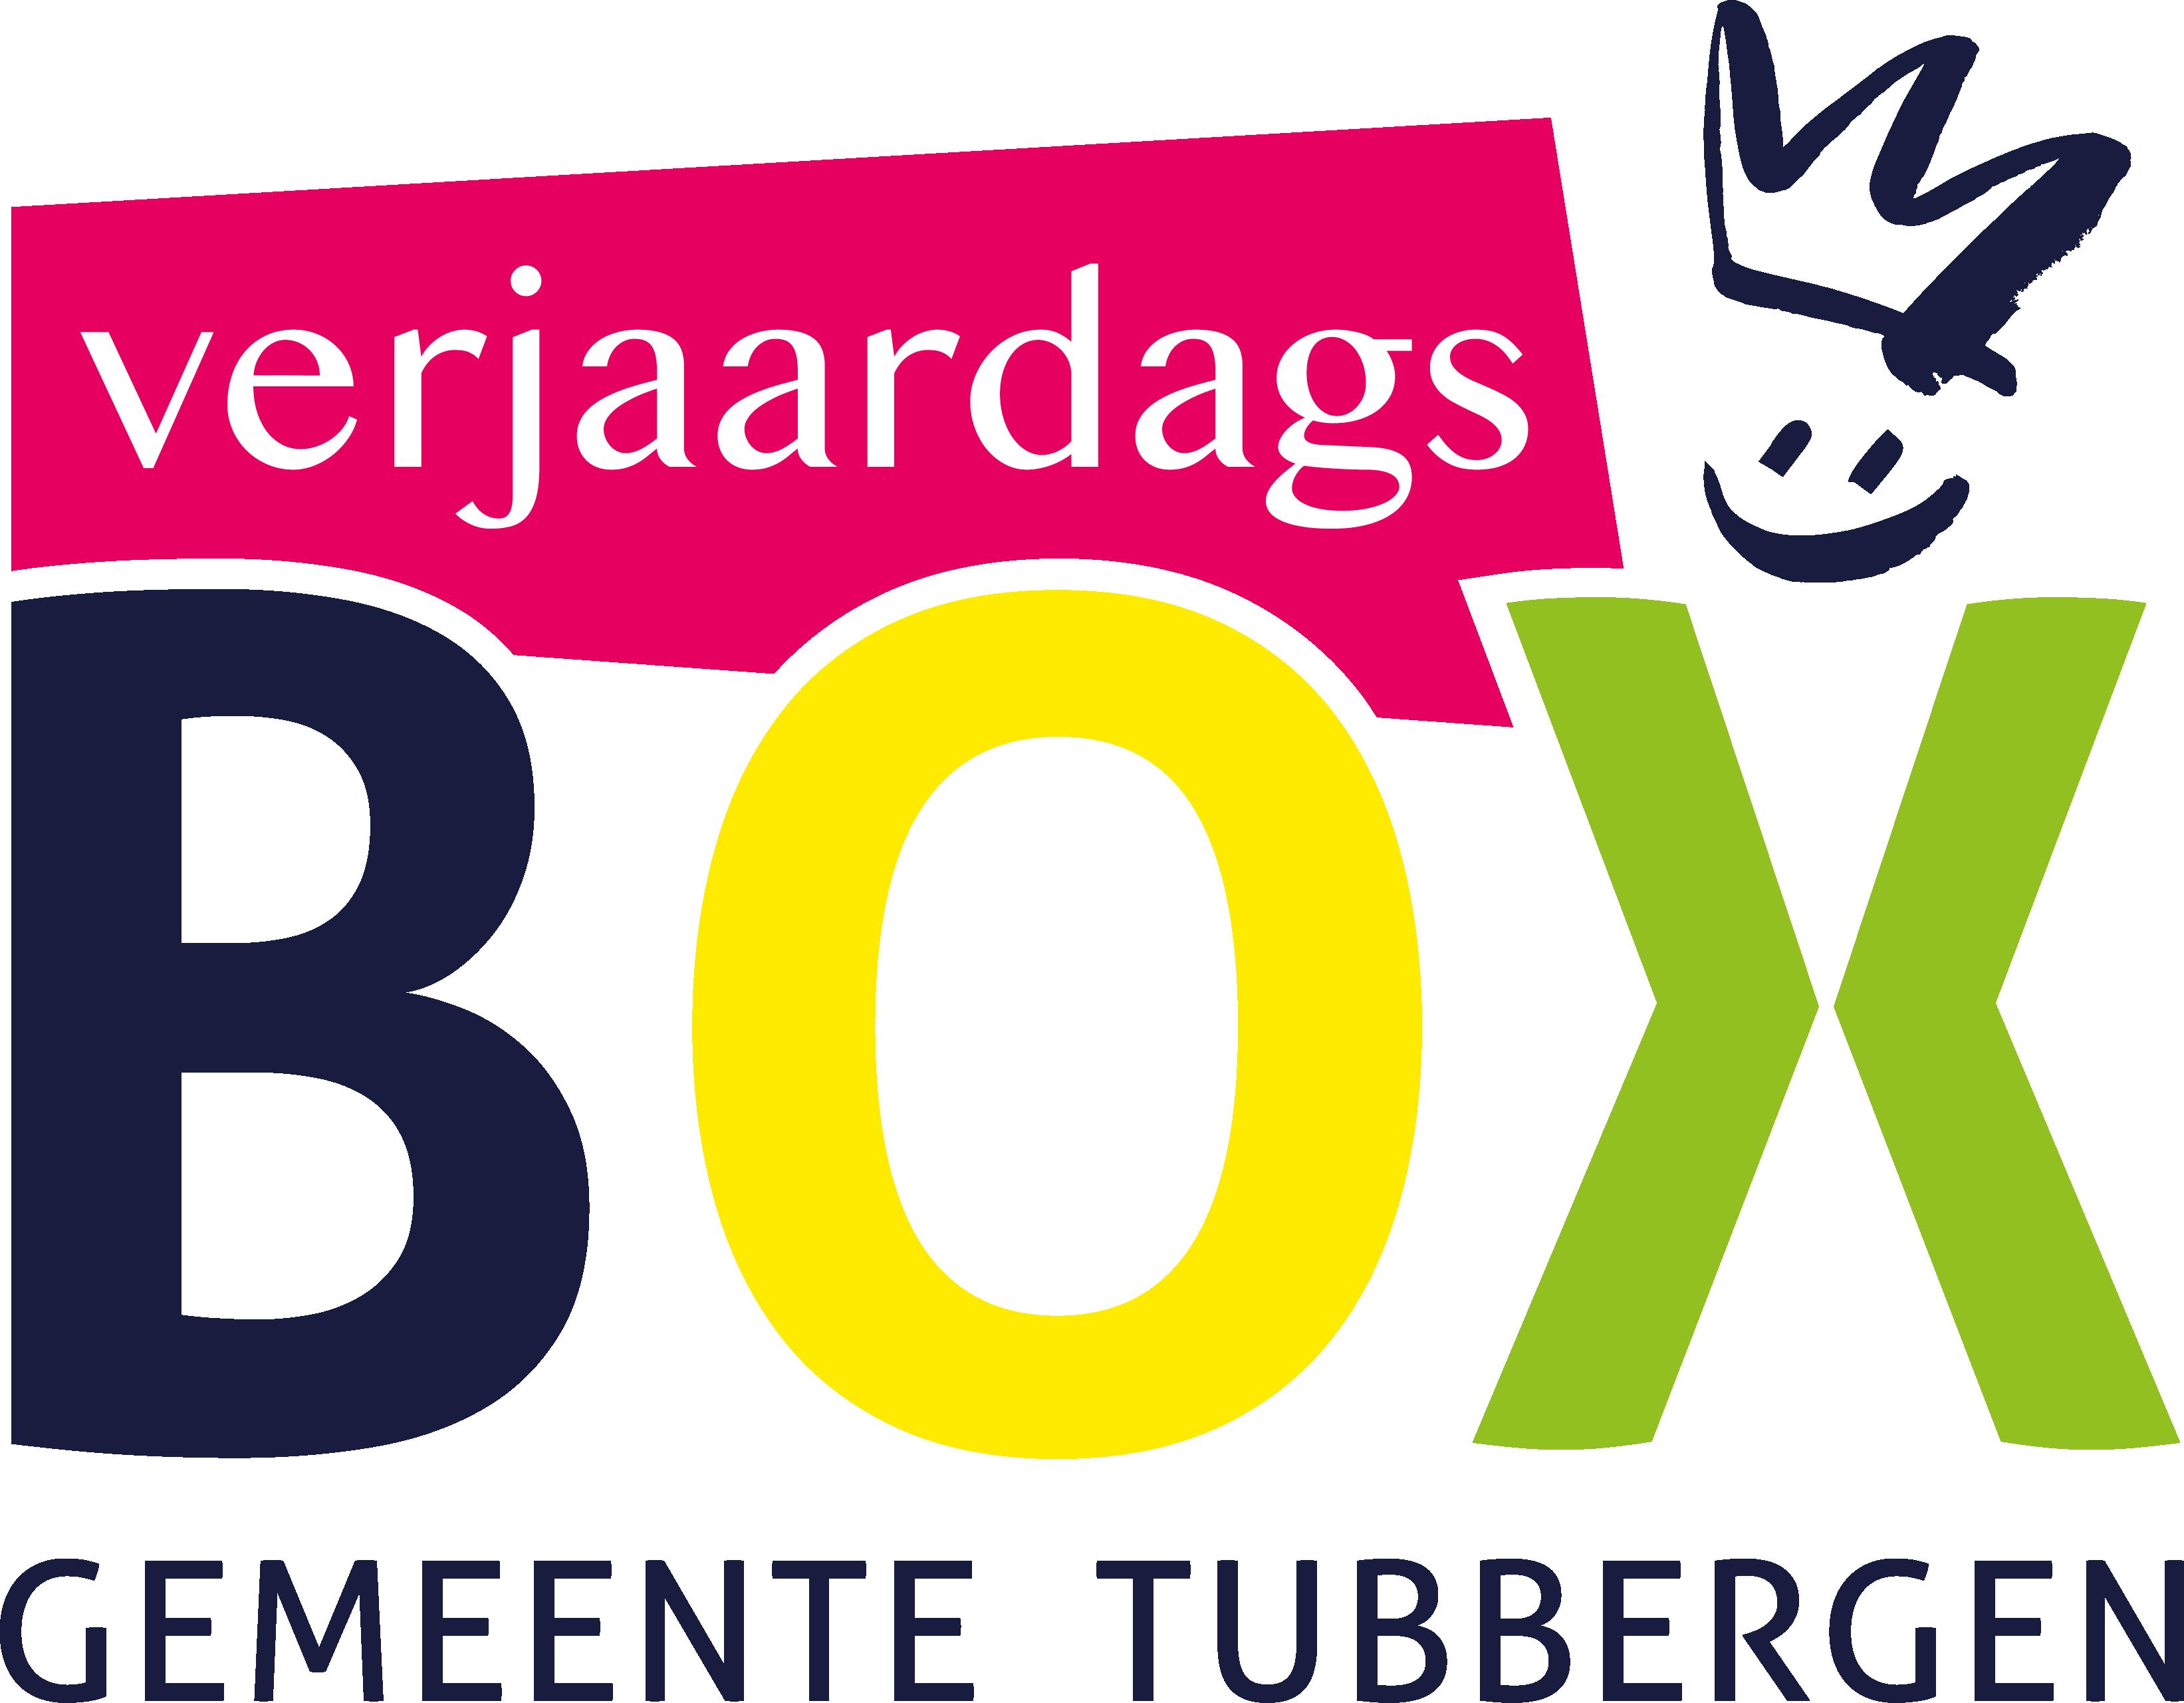 Privacyverklaring - Verjaardagsbox Tubbergen